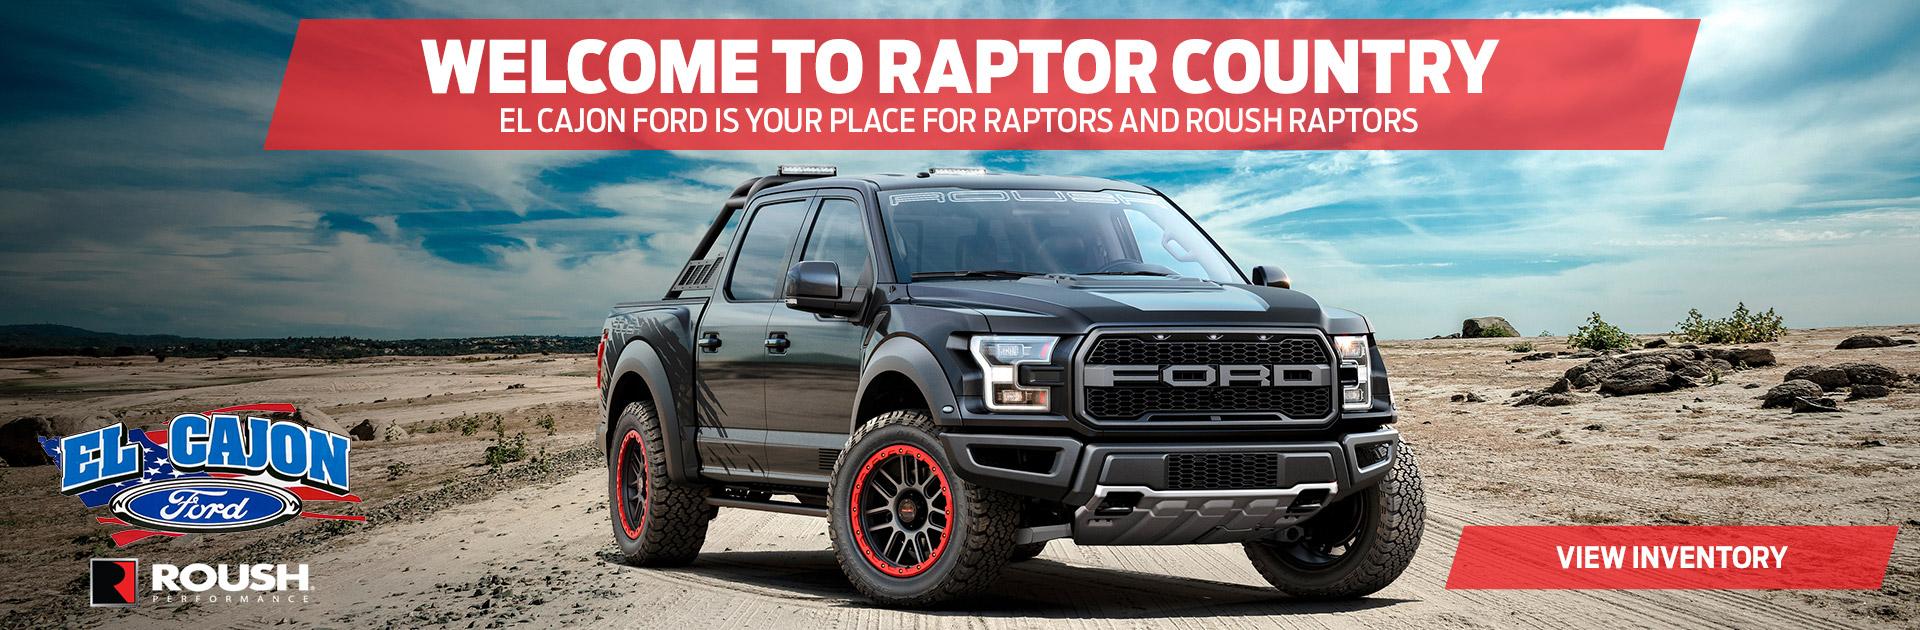 El Cajon Raptor Country